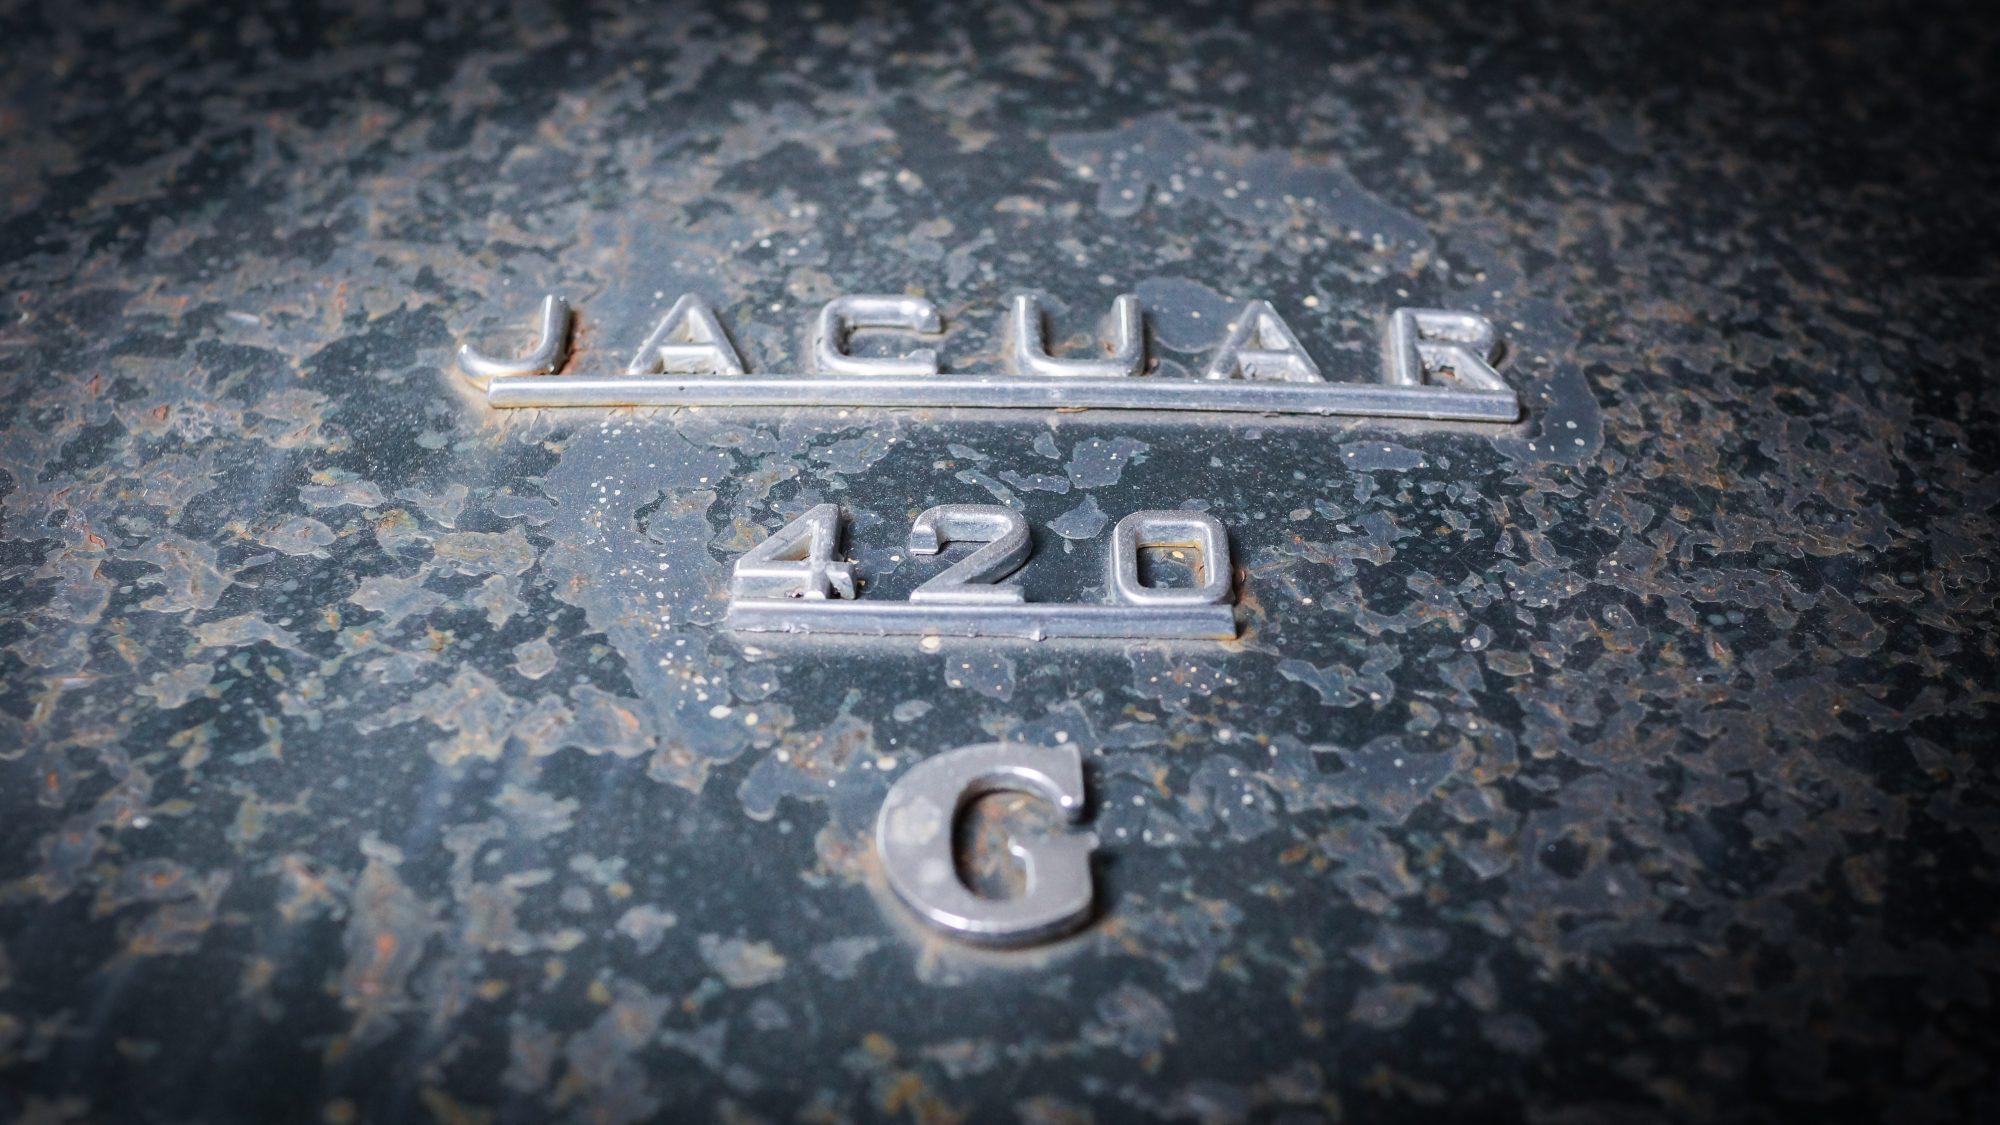 Jaguar, Jaguar 420G, 420G, The Krays, Ronnie and Reggie Kray, 420G badge